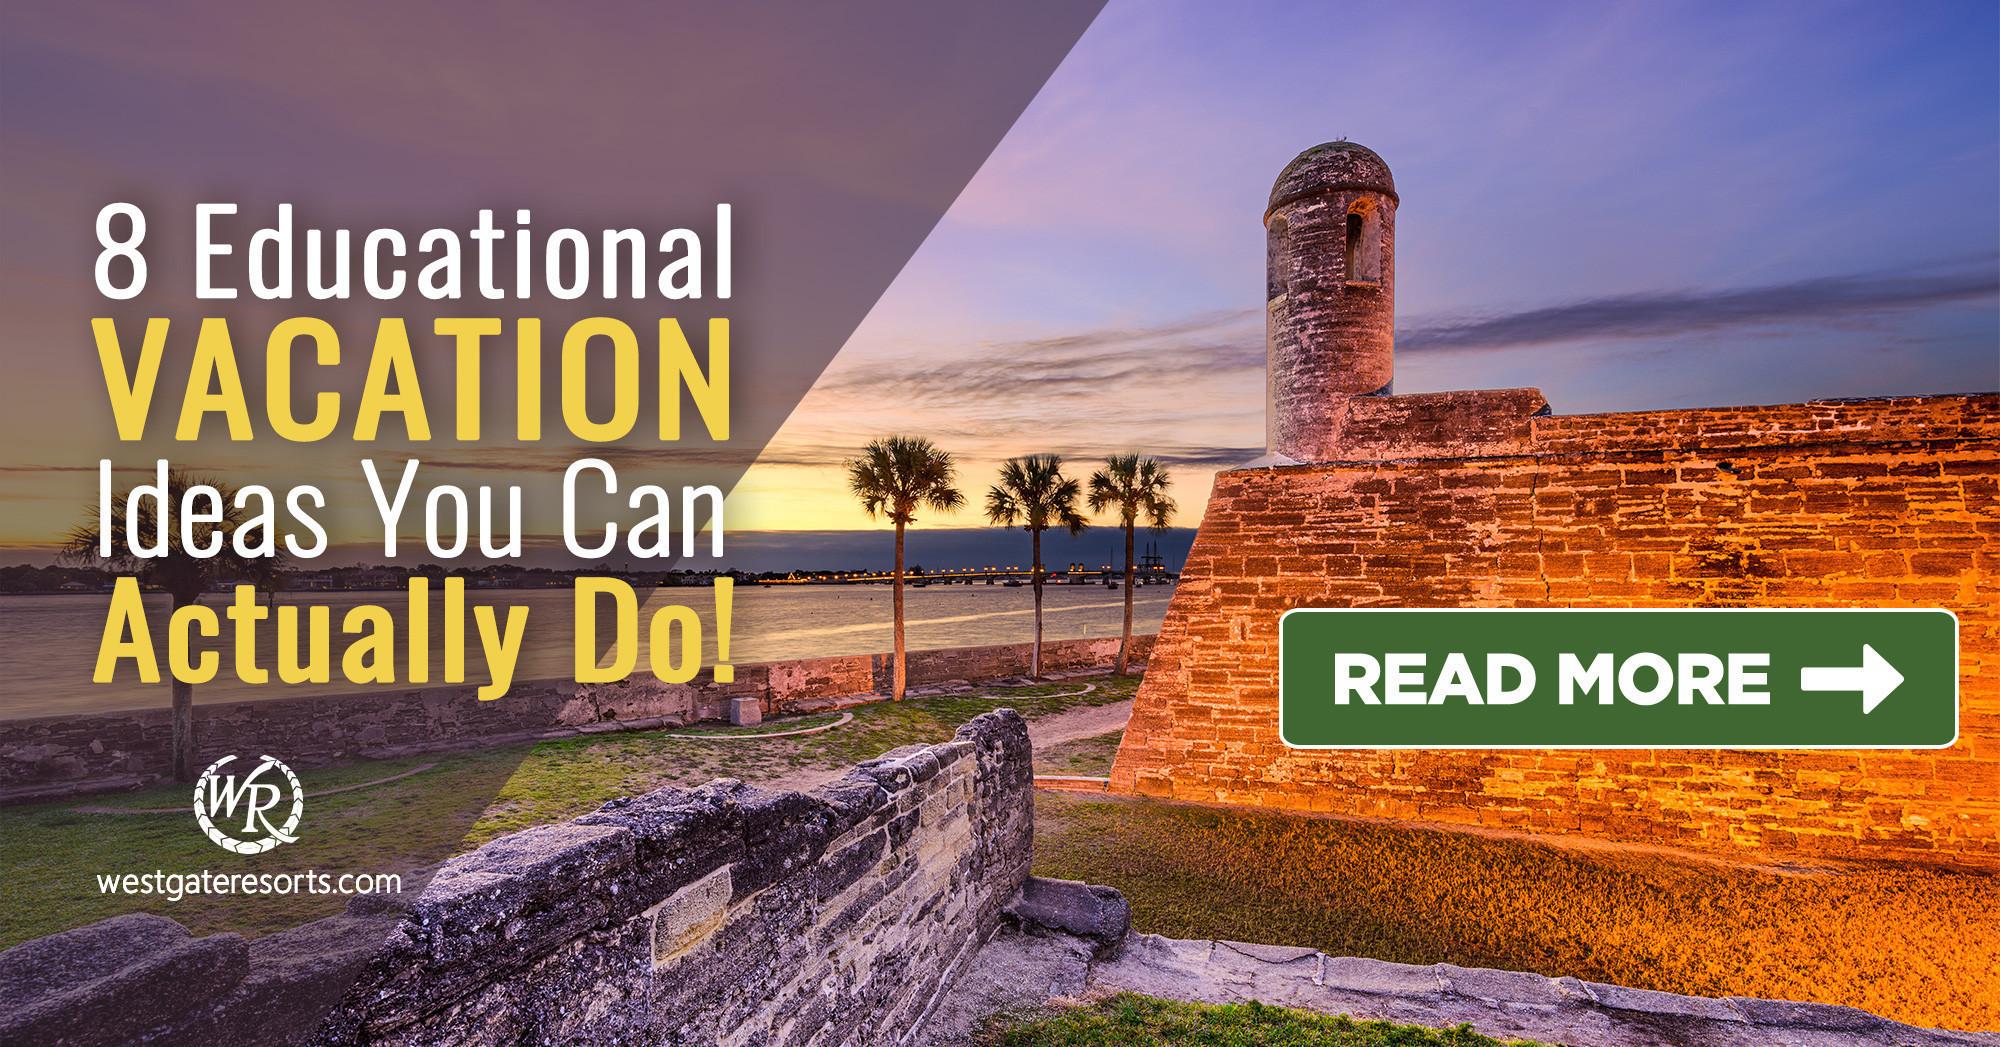 8 Educational Vacation Ideas You Can Actually Do!